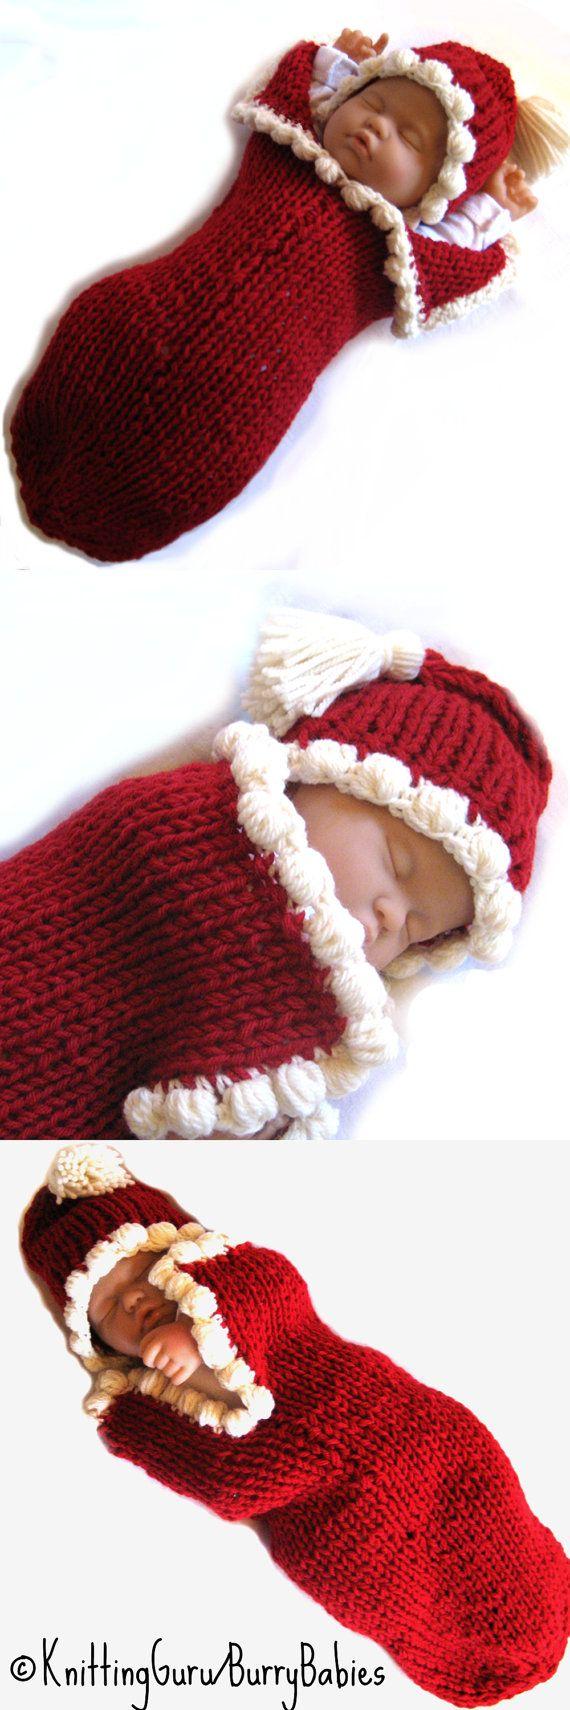 Easy Knitting Pattern For Christmas : Baby santa knitting pattern fast easy diy christmas